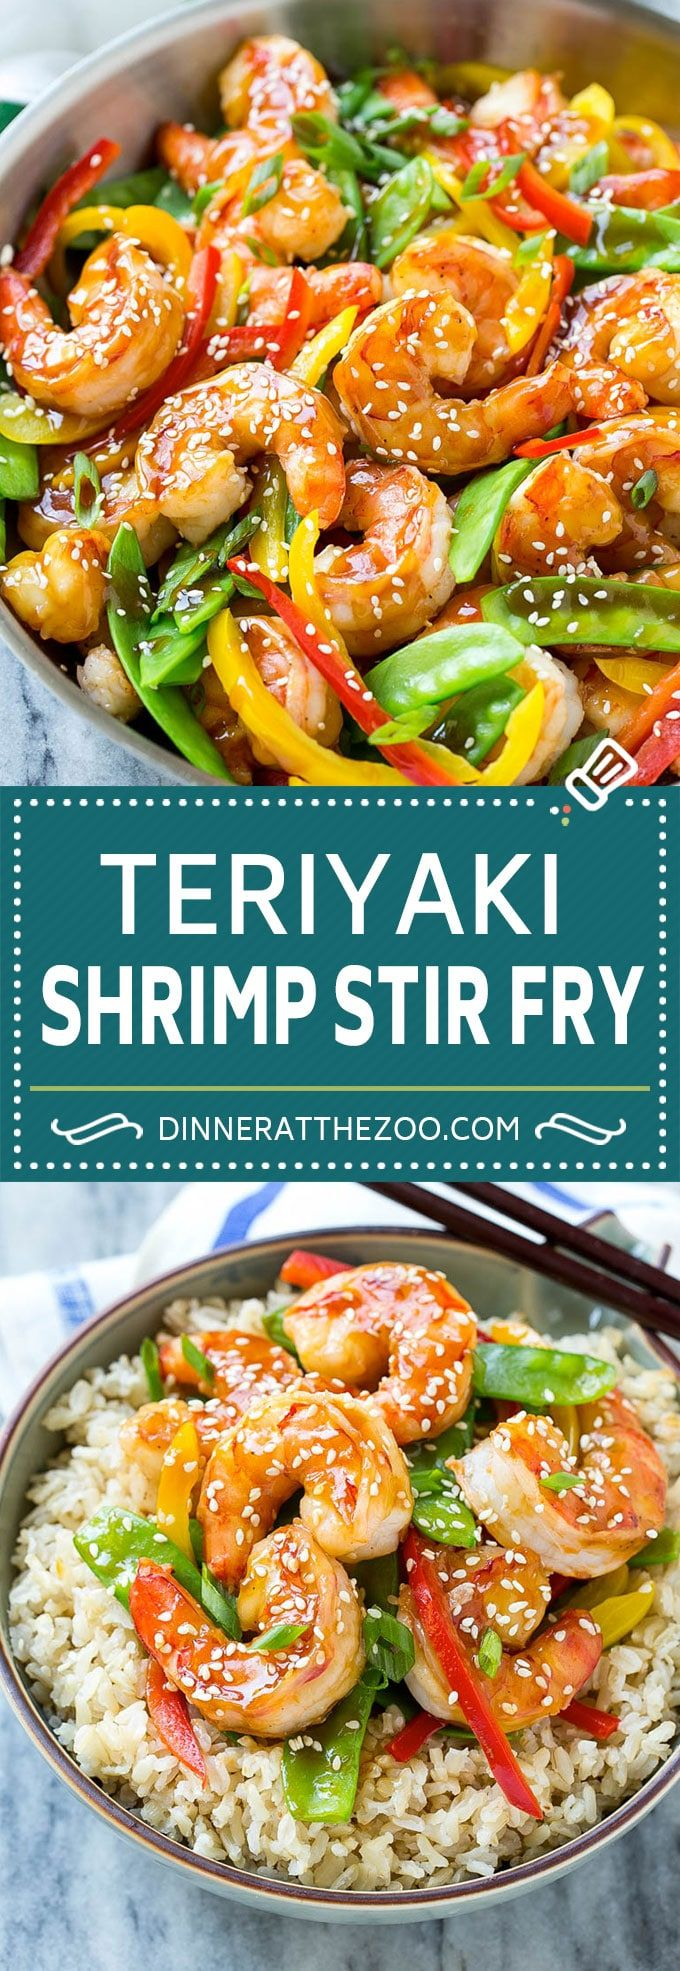 Teriyaki Shrimp Stir Fry - Dinner at the Zoo